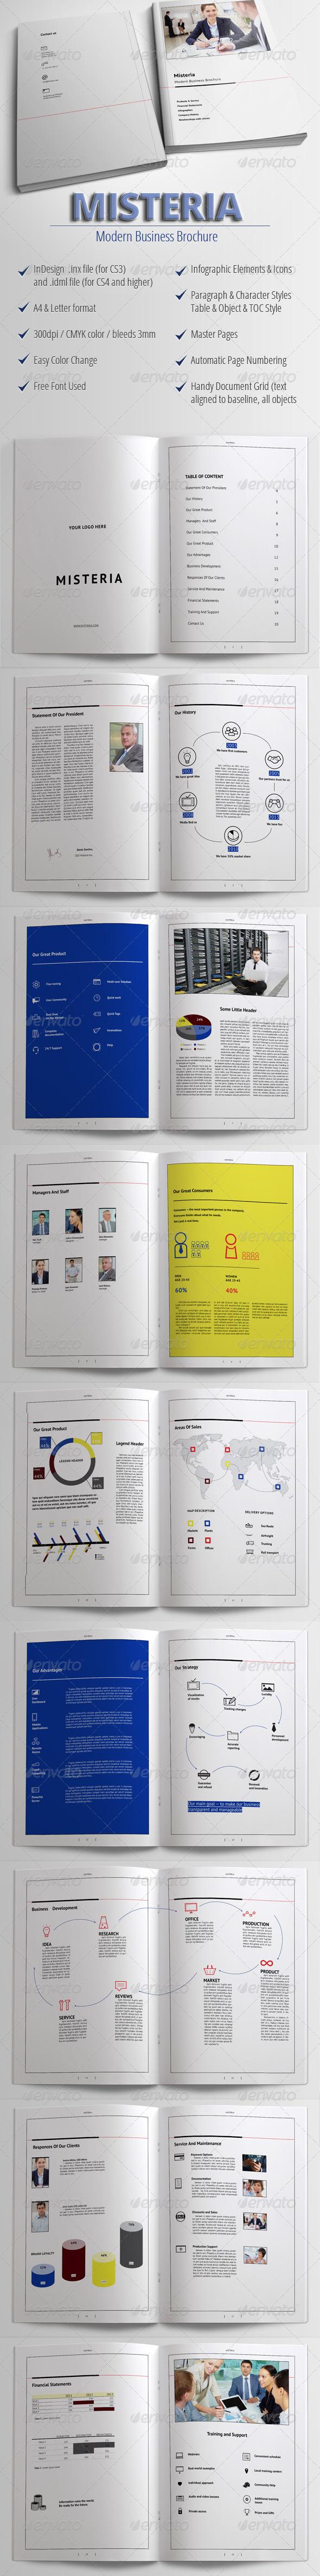 Misteria - Modern Business Brochure - Corporate Brochures